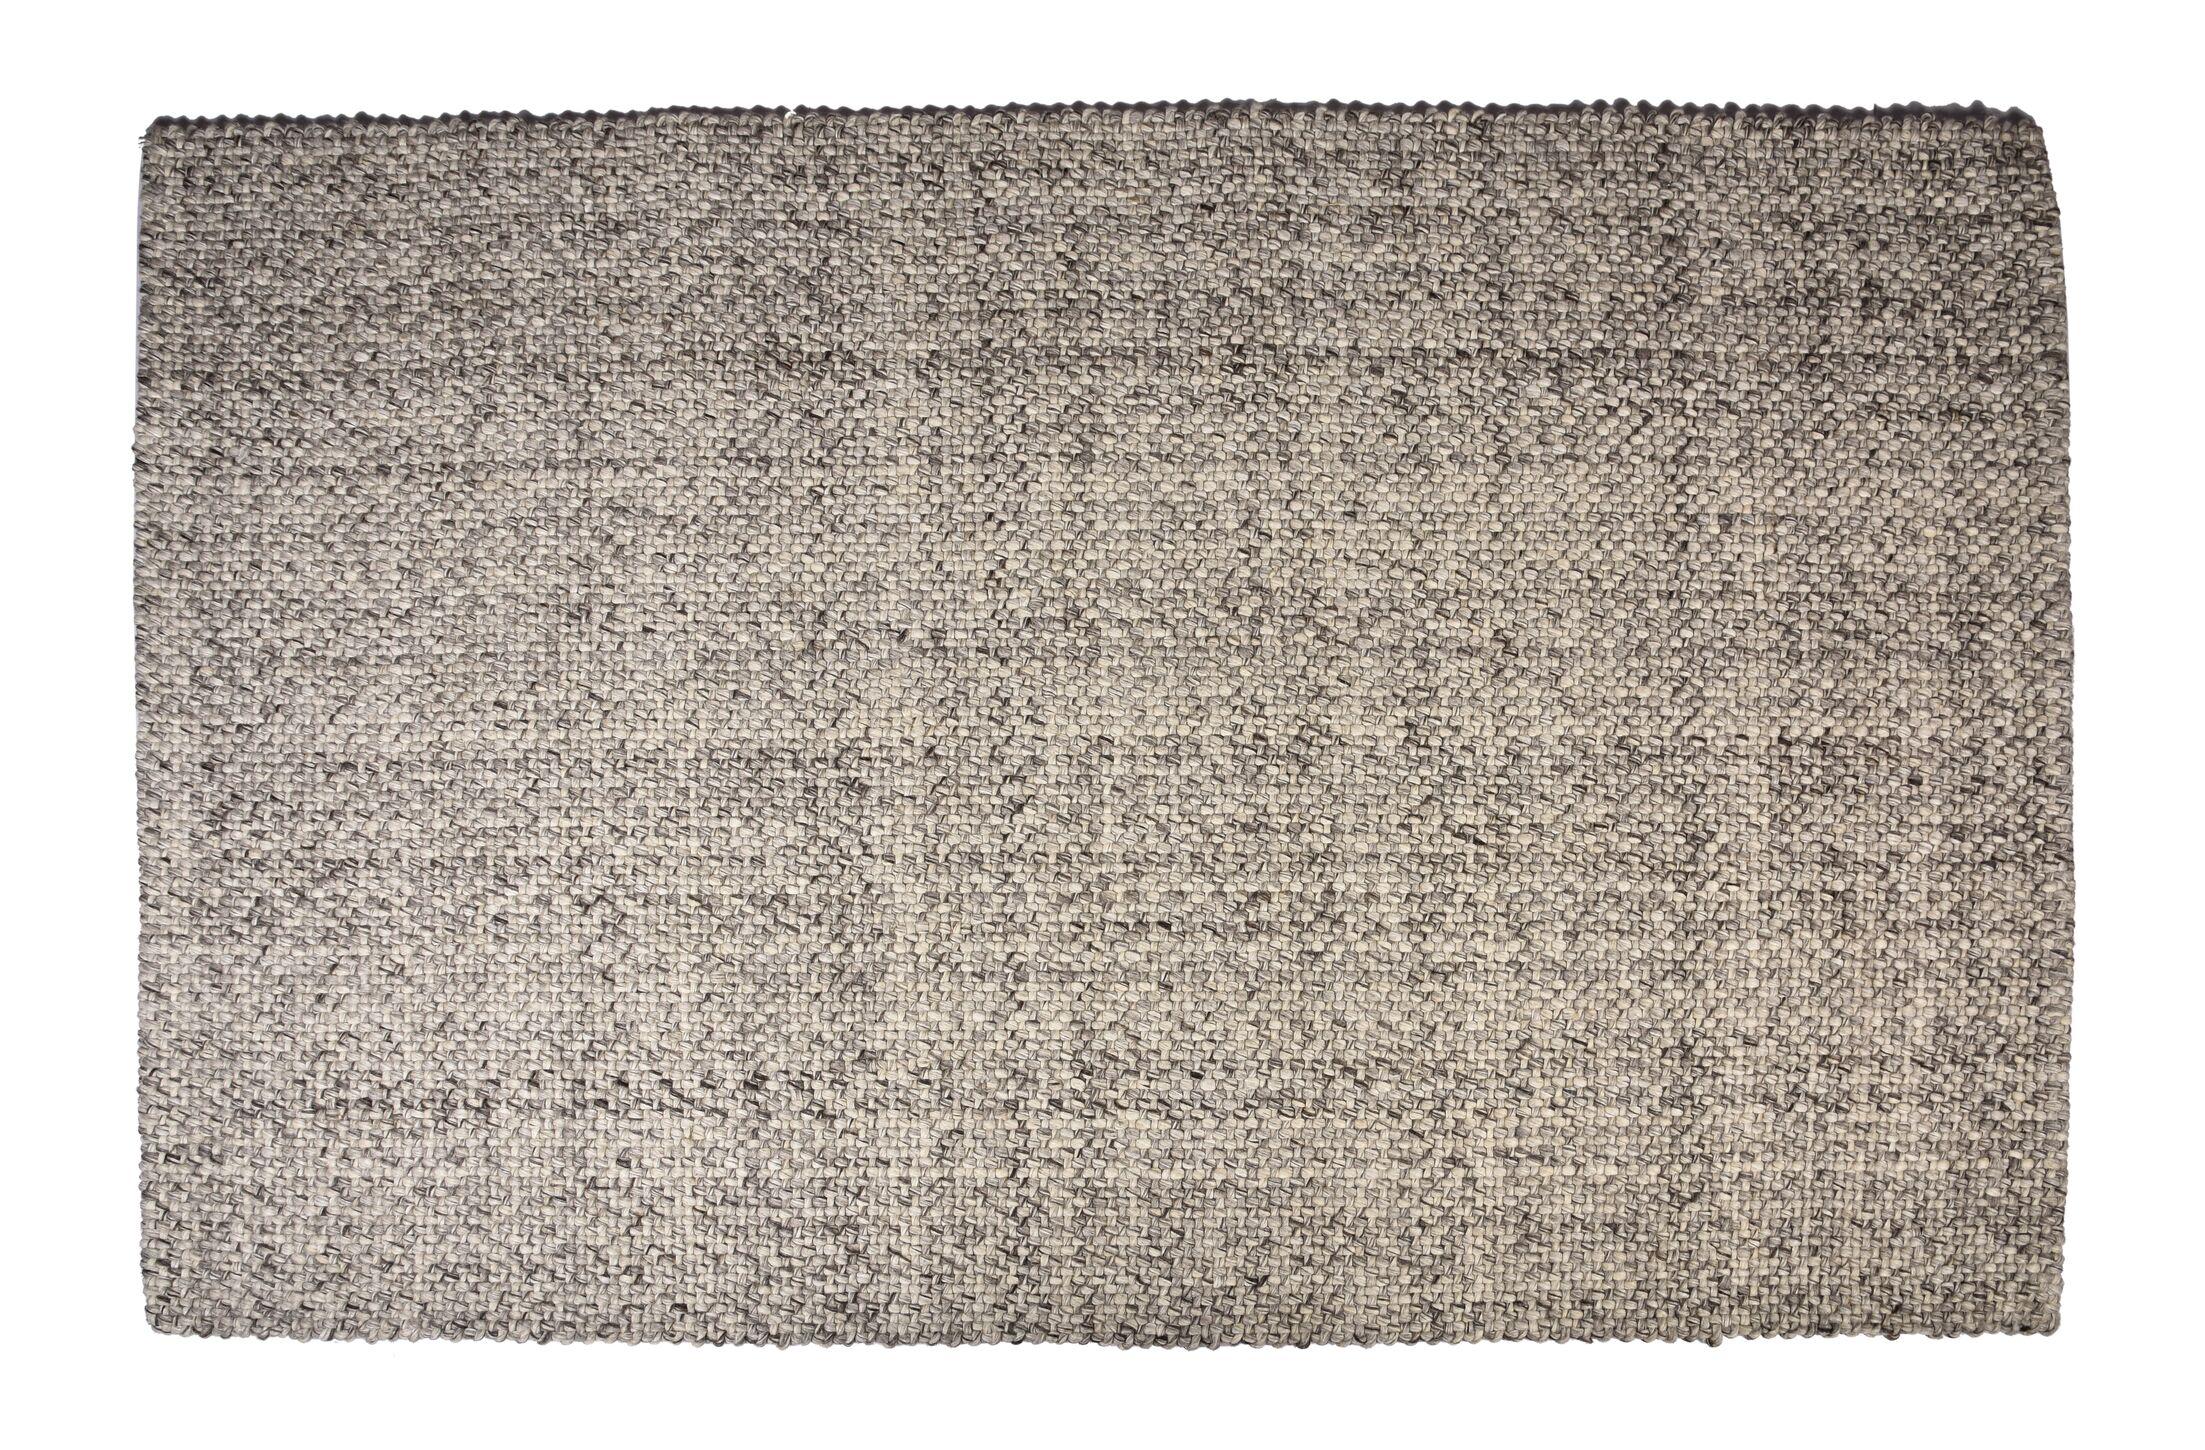 Botello Hand-Woven Wool Ash Gray Area Rug Rug Size: Rectangle 8' x 10'